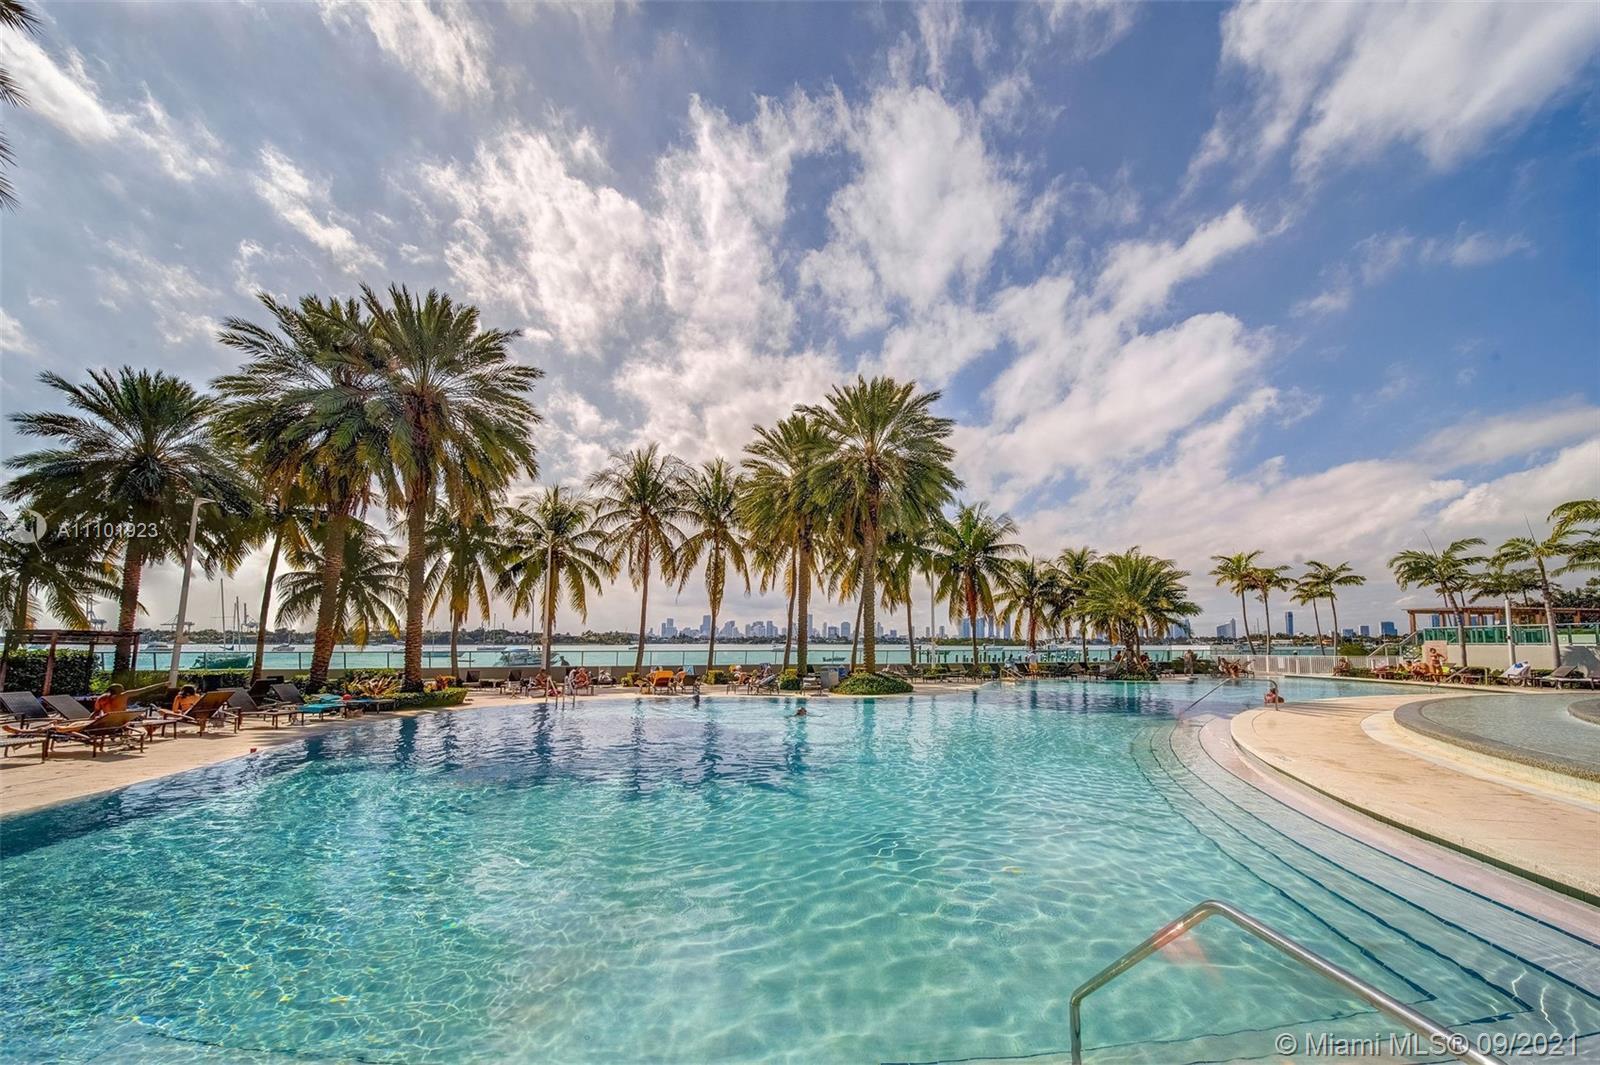 Flamingo Point,Flamingo South Beach Condo,For Rent,Flamingo Point,Flamingo South Beach Brickell,realty,broker,condos near me